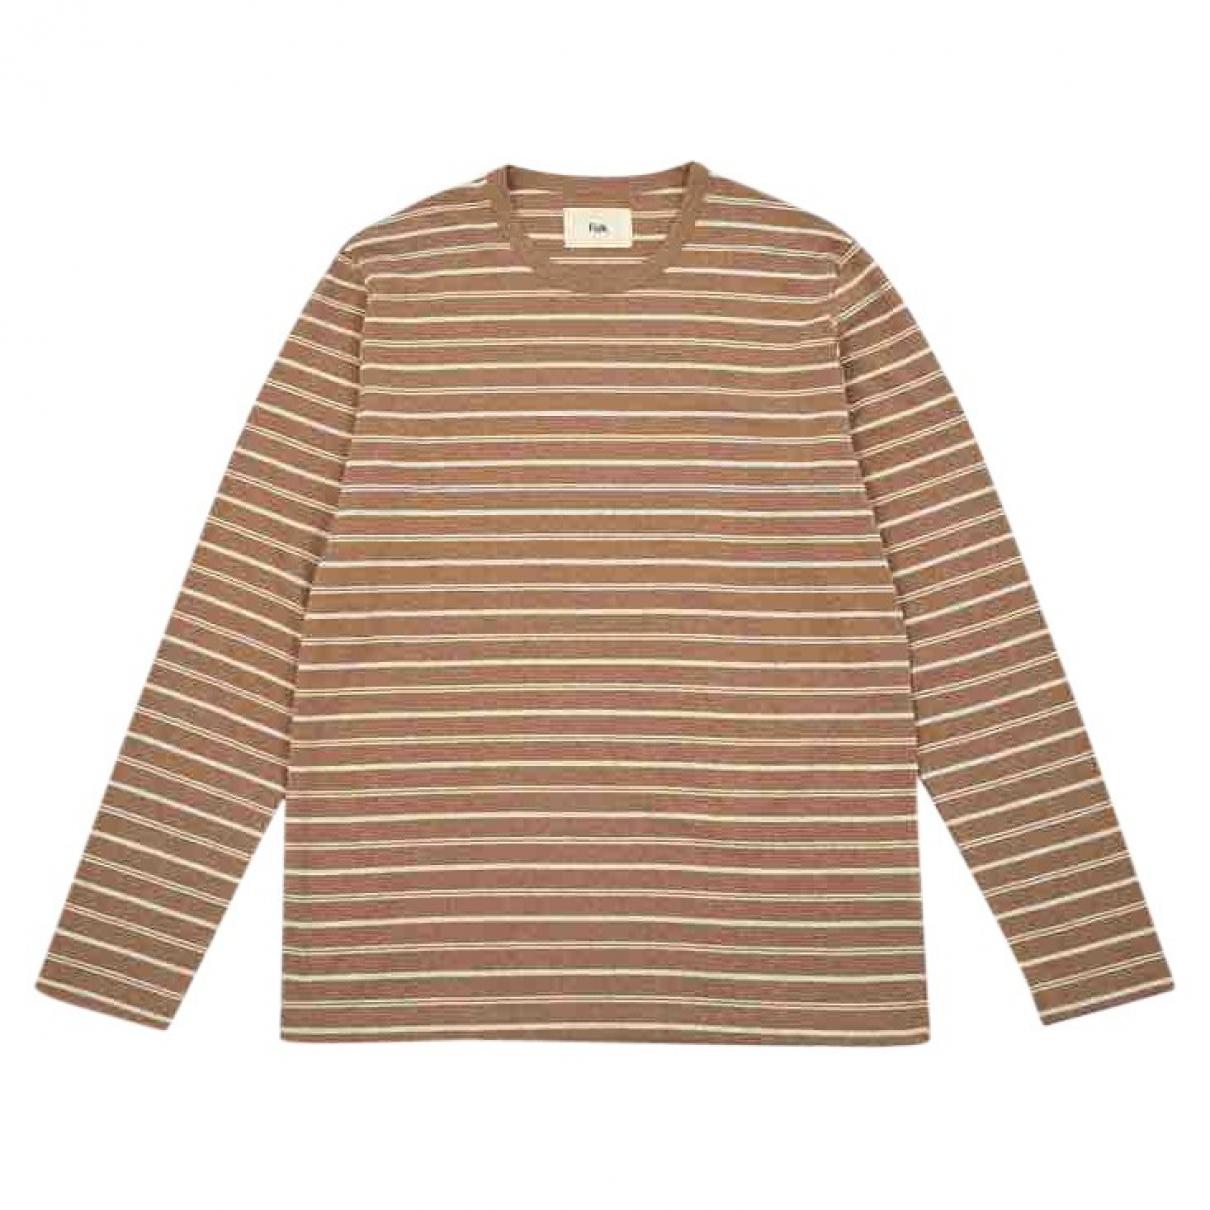 Folk \N Beige Cotton T-shirts for Men 3 0 - 6